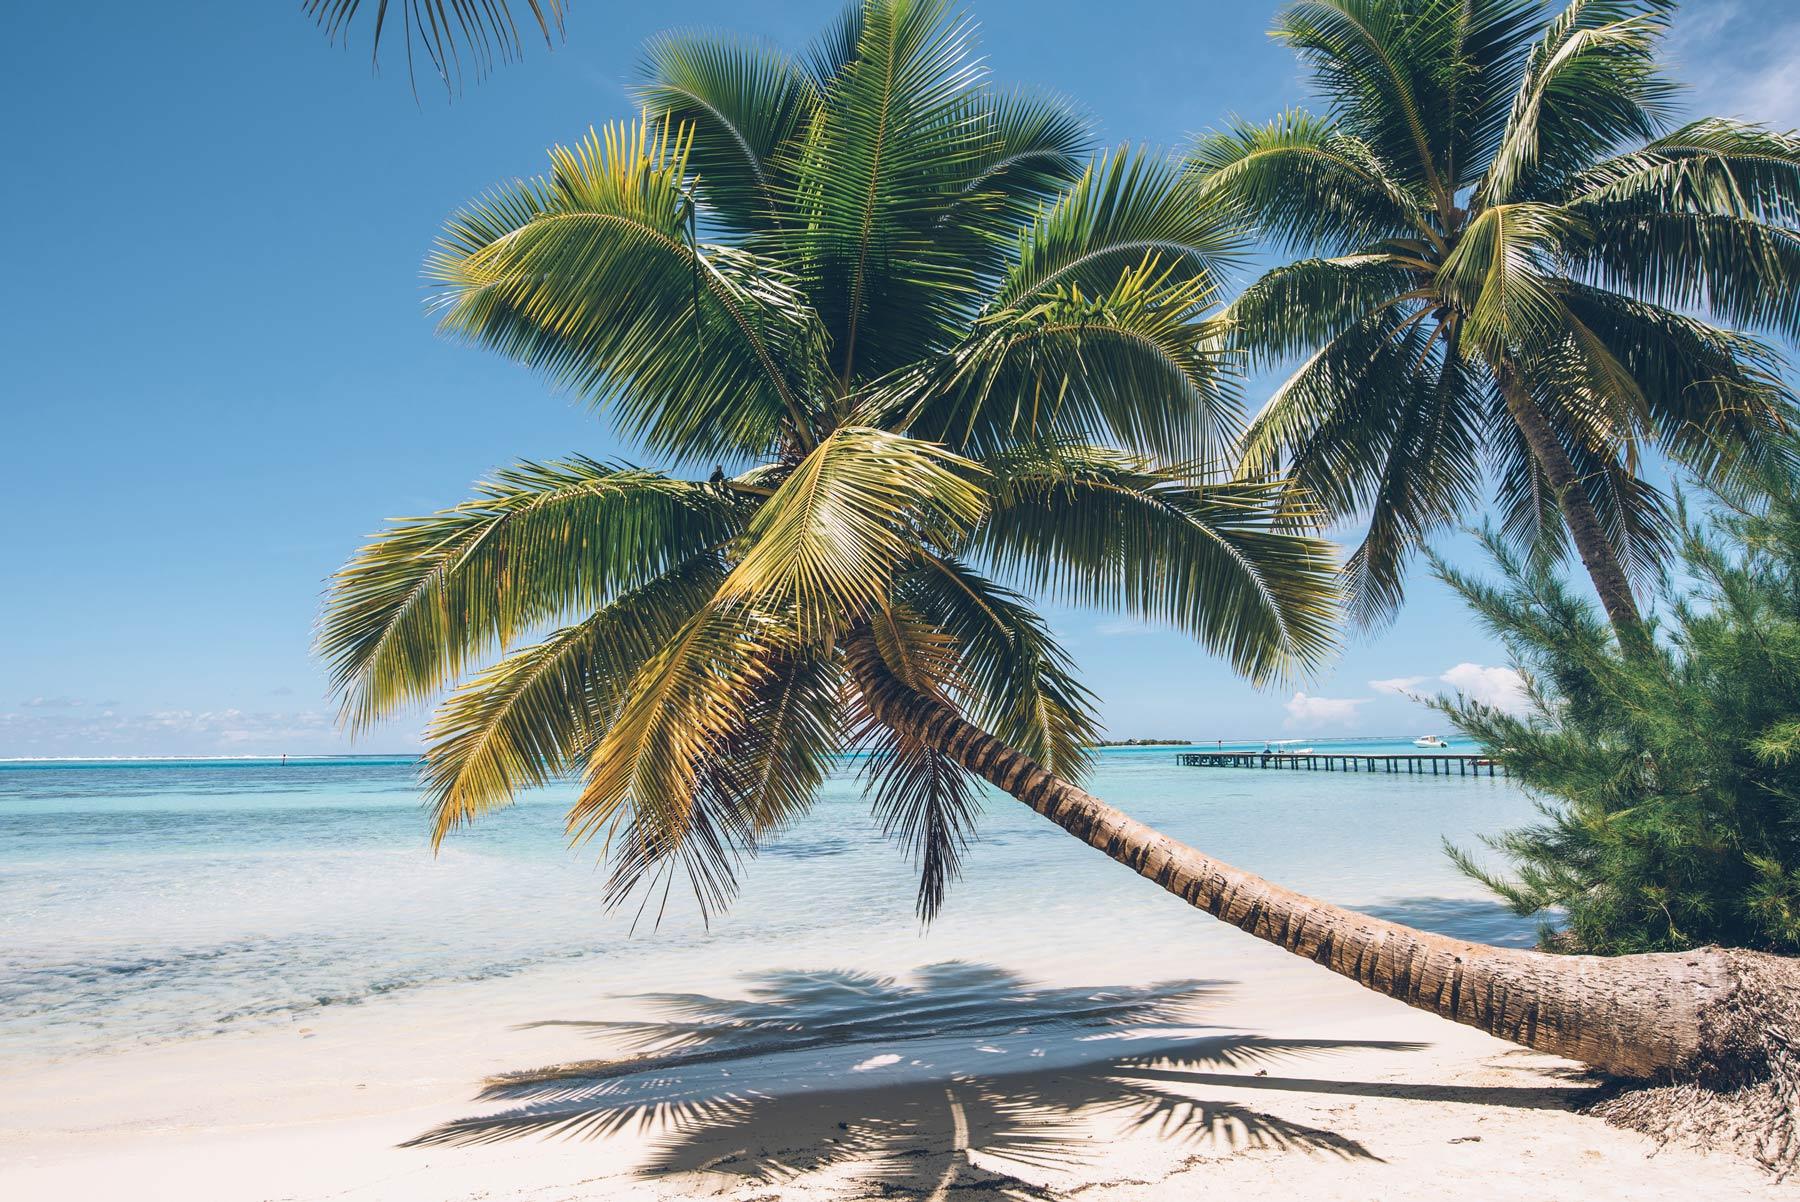 Tipanier, Moorea, Polynésie Française